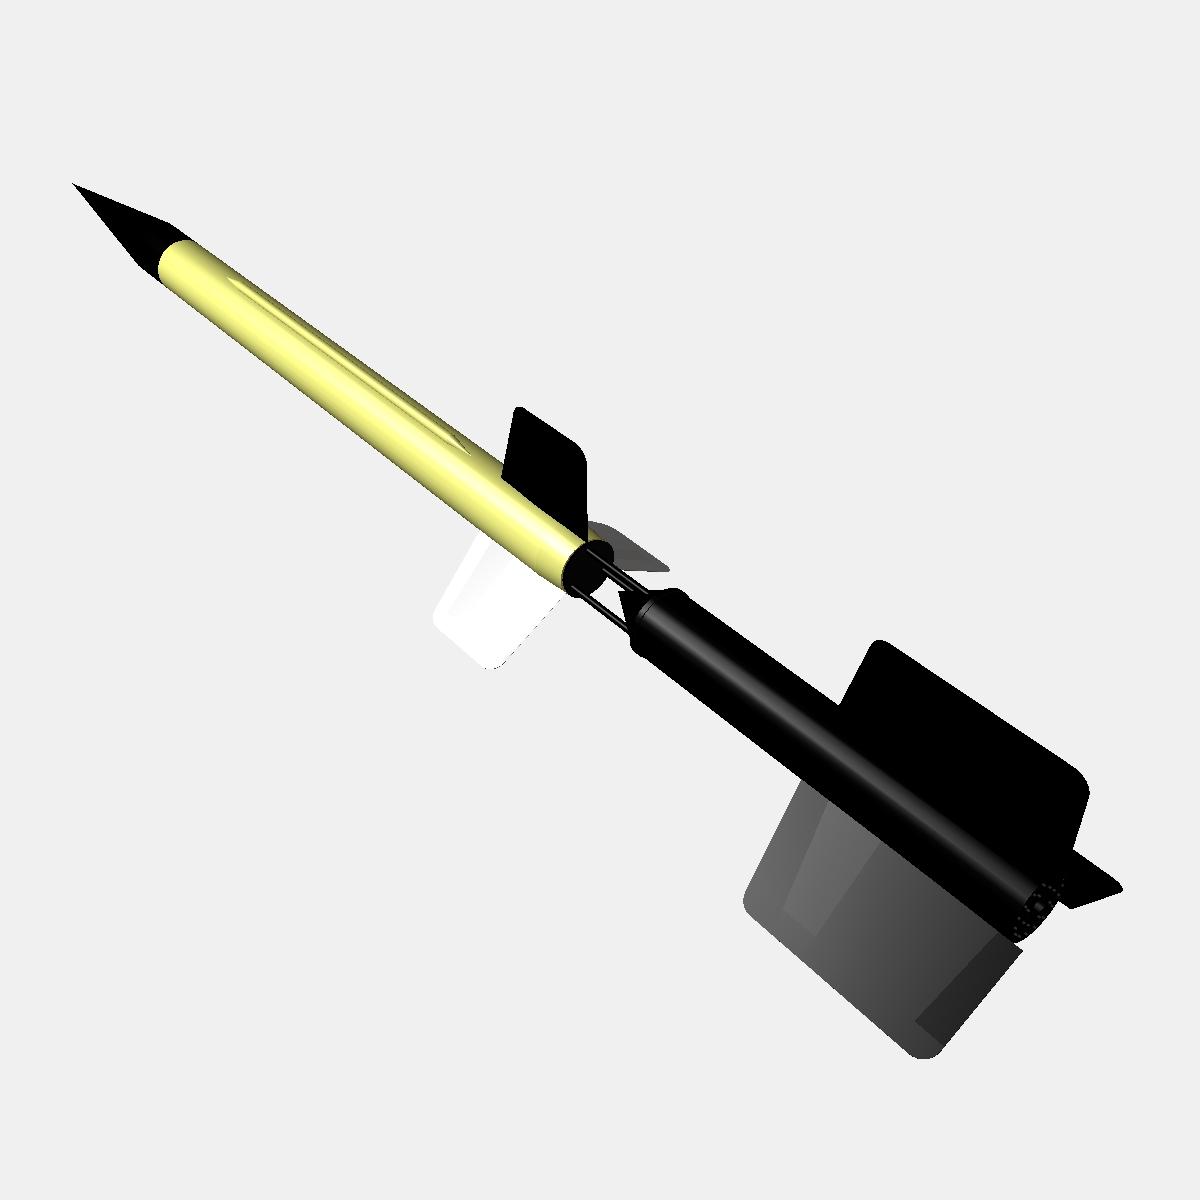 us wac corporal rocket 3d model 3ds dxf x cod scn obj 149621